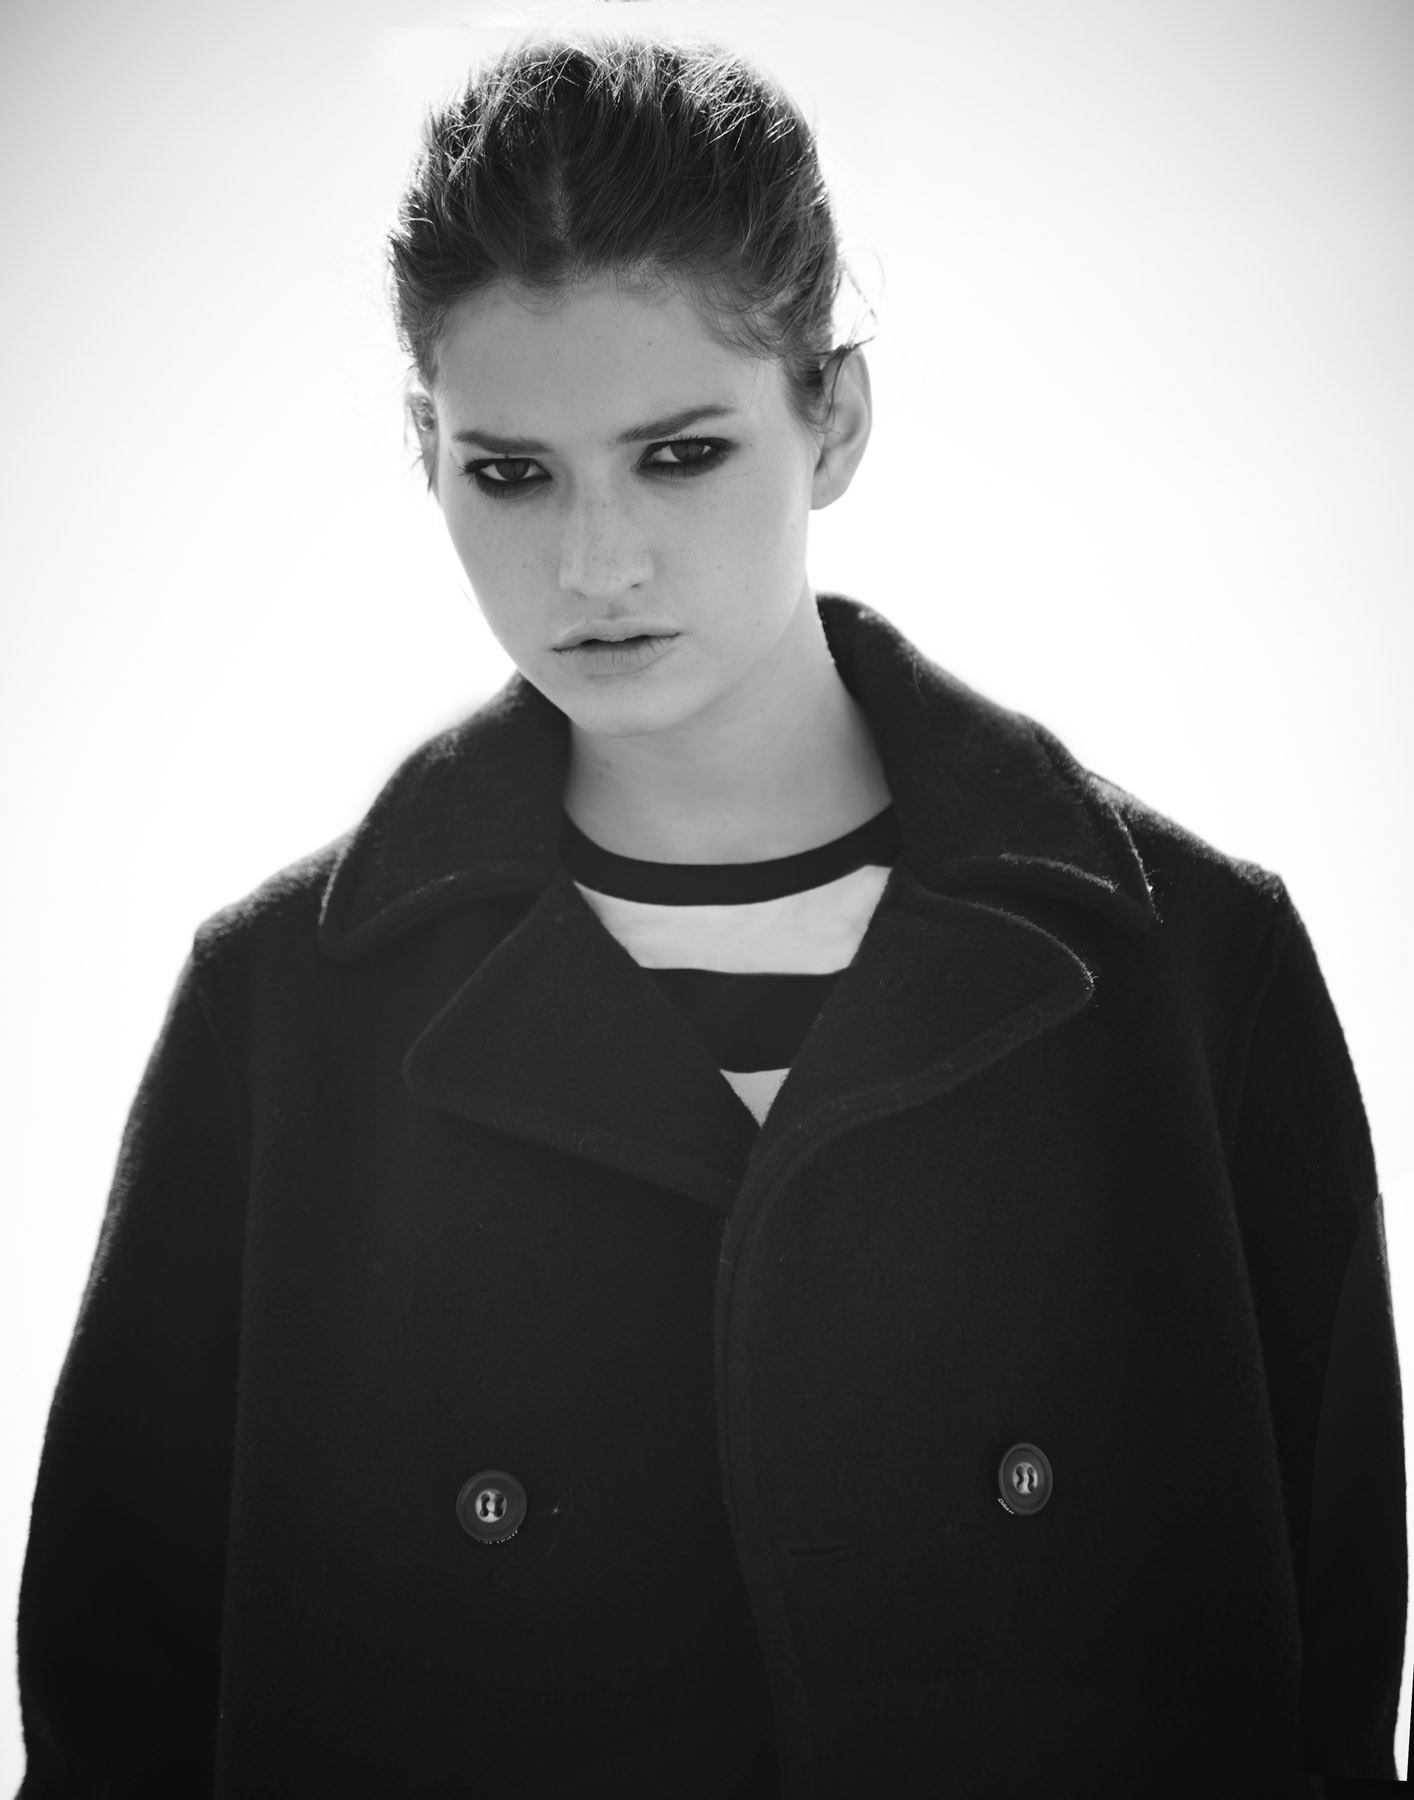 Alicia Davis by Jason Sadourian - CHASSEUR MAGAZINE